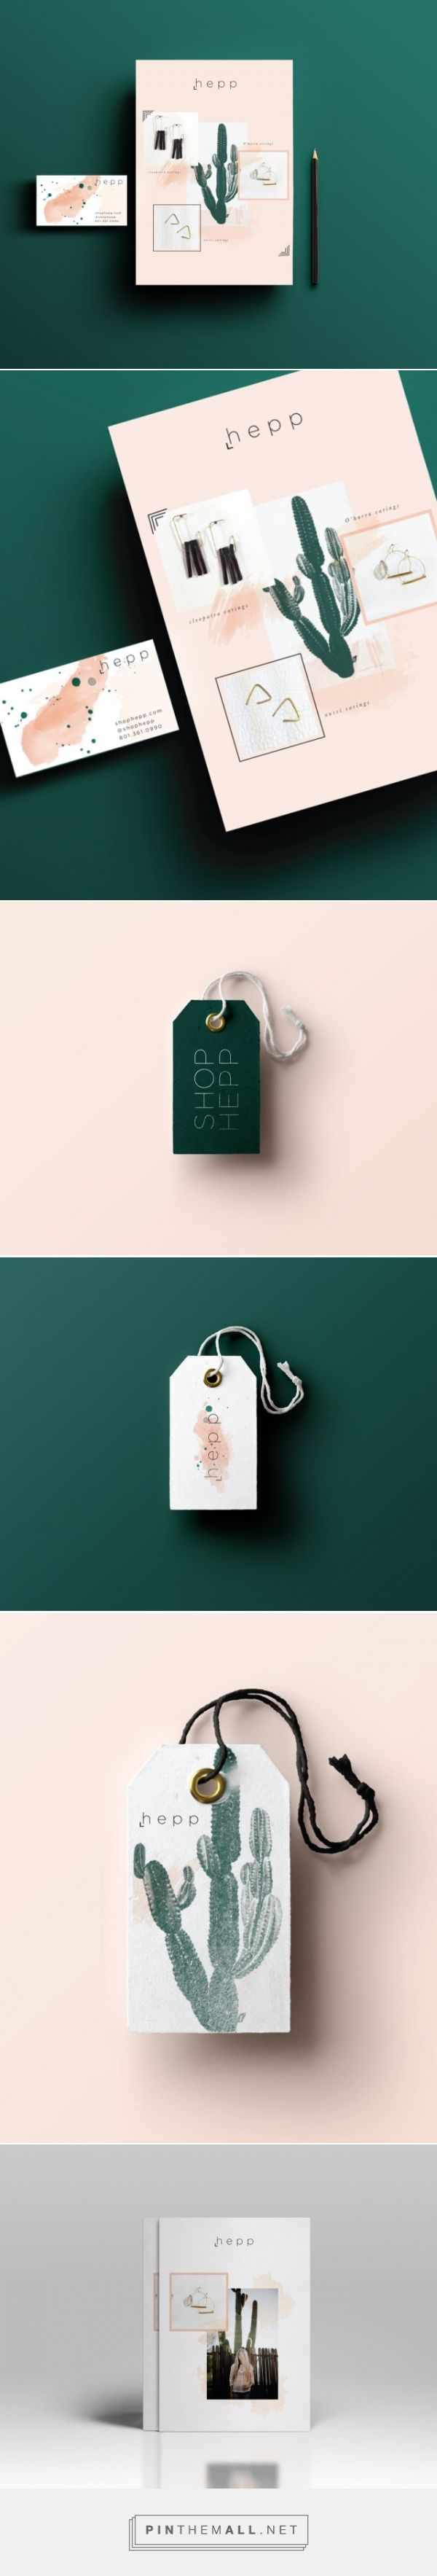 Hepp Branding by West End Girl Studio | Fivestar Branding – Design and Branding Agency & Inspiration Gallery